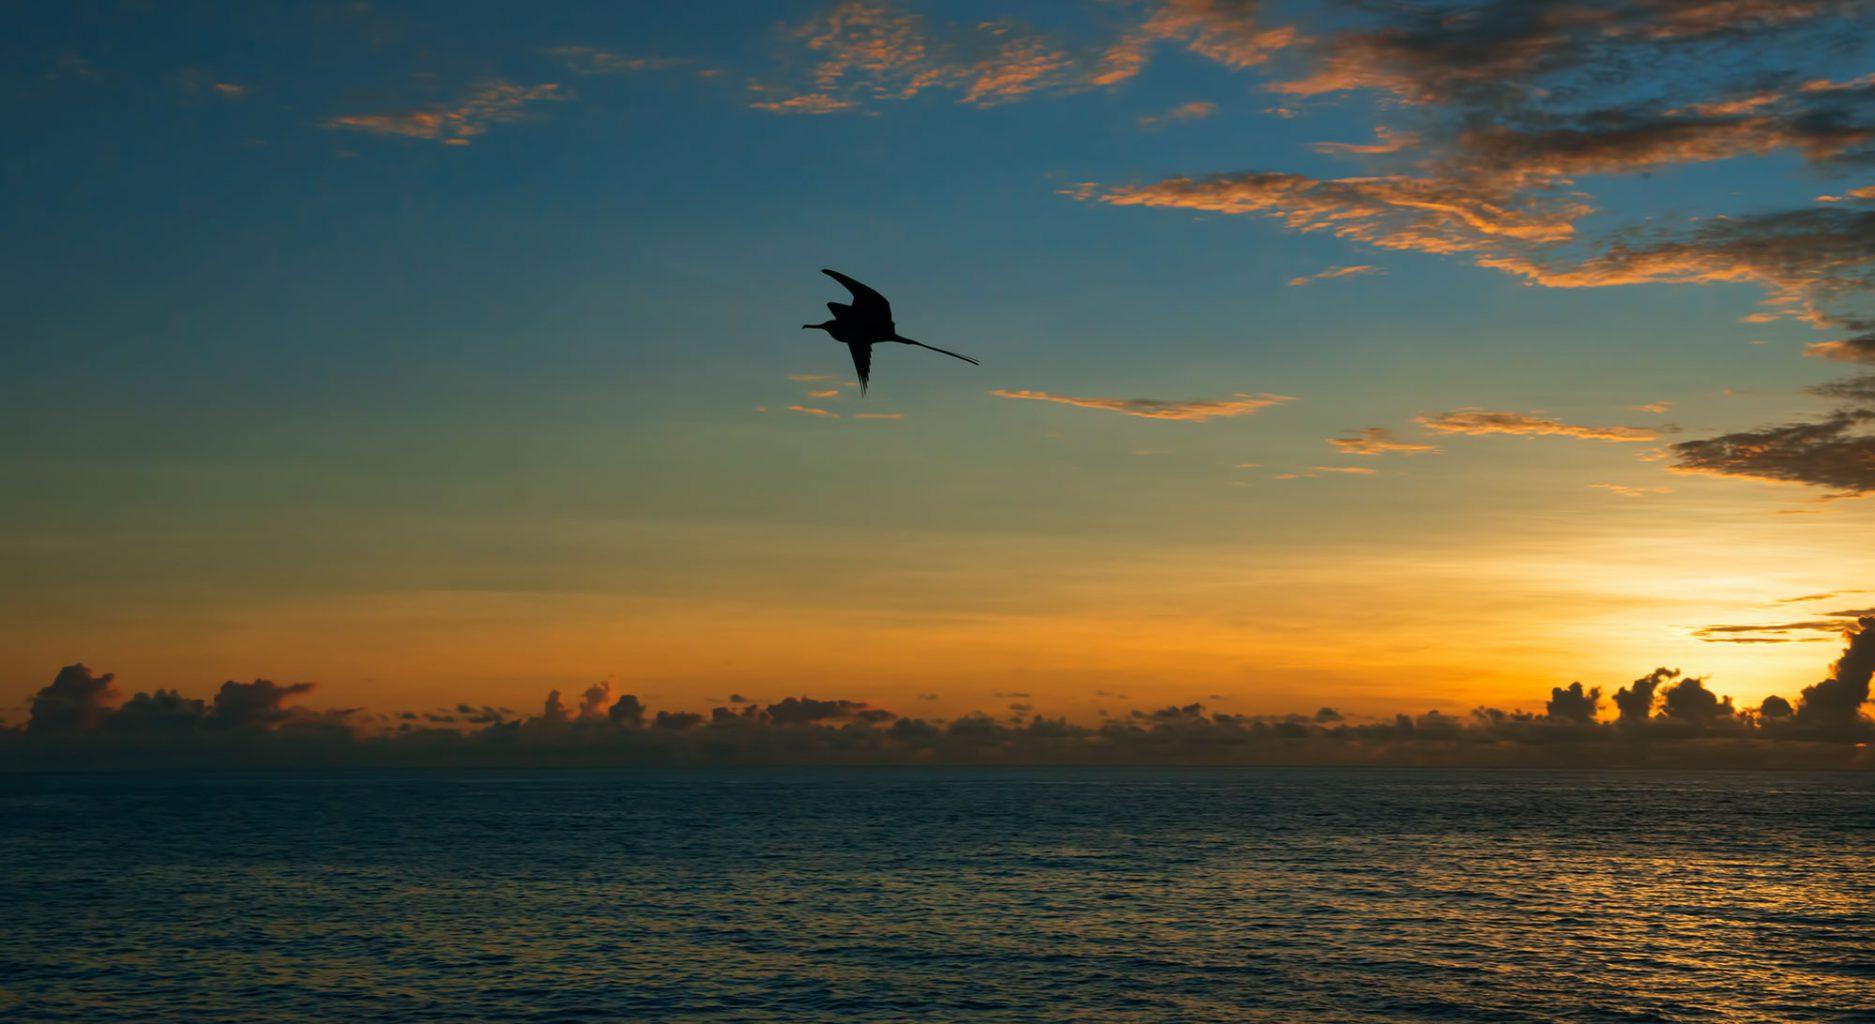 Galapagos Islands Sunset, Sonnenuntergang